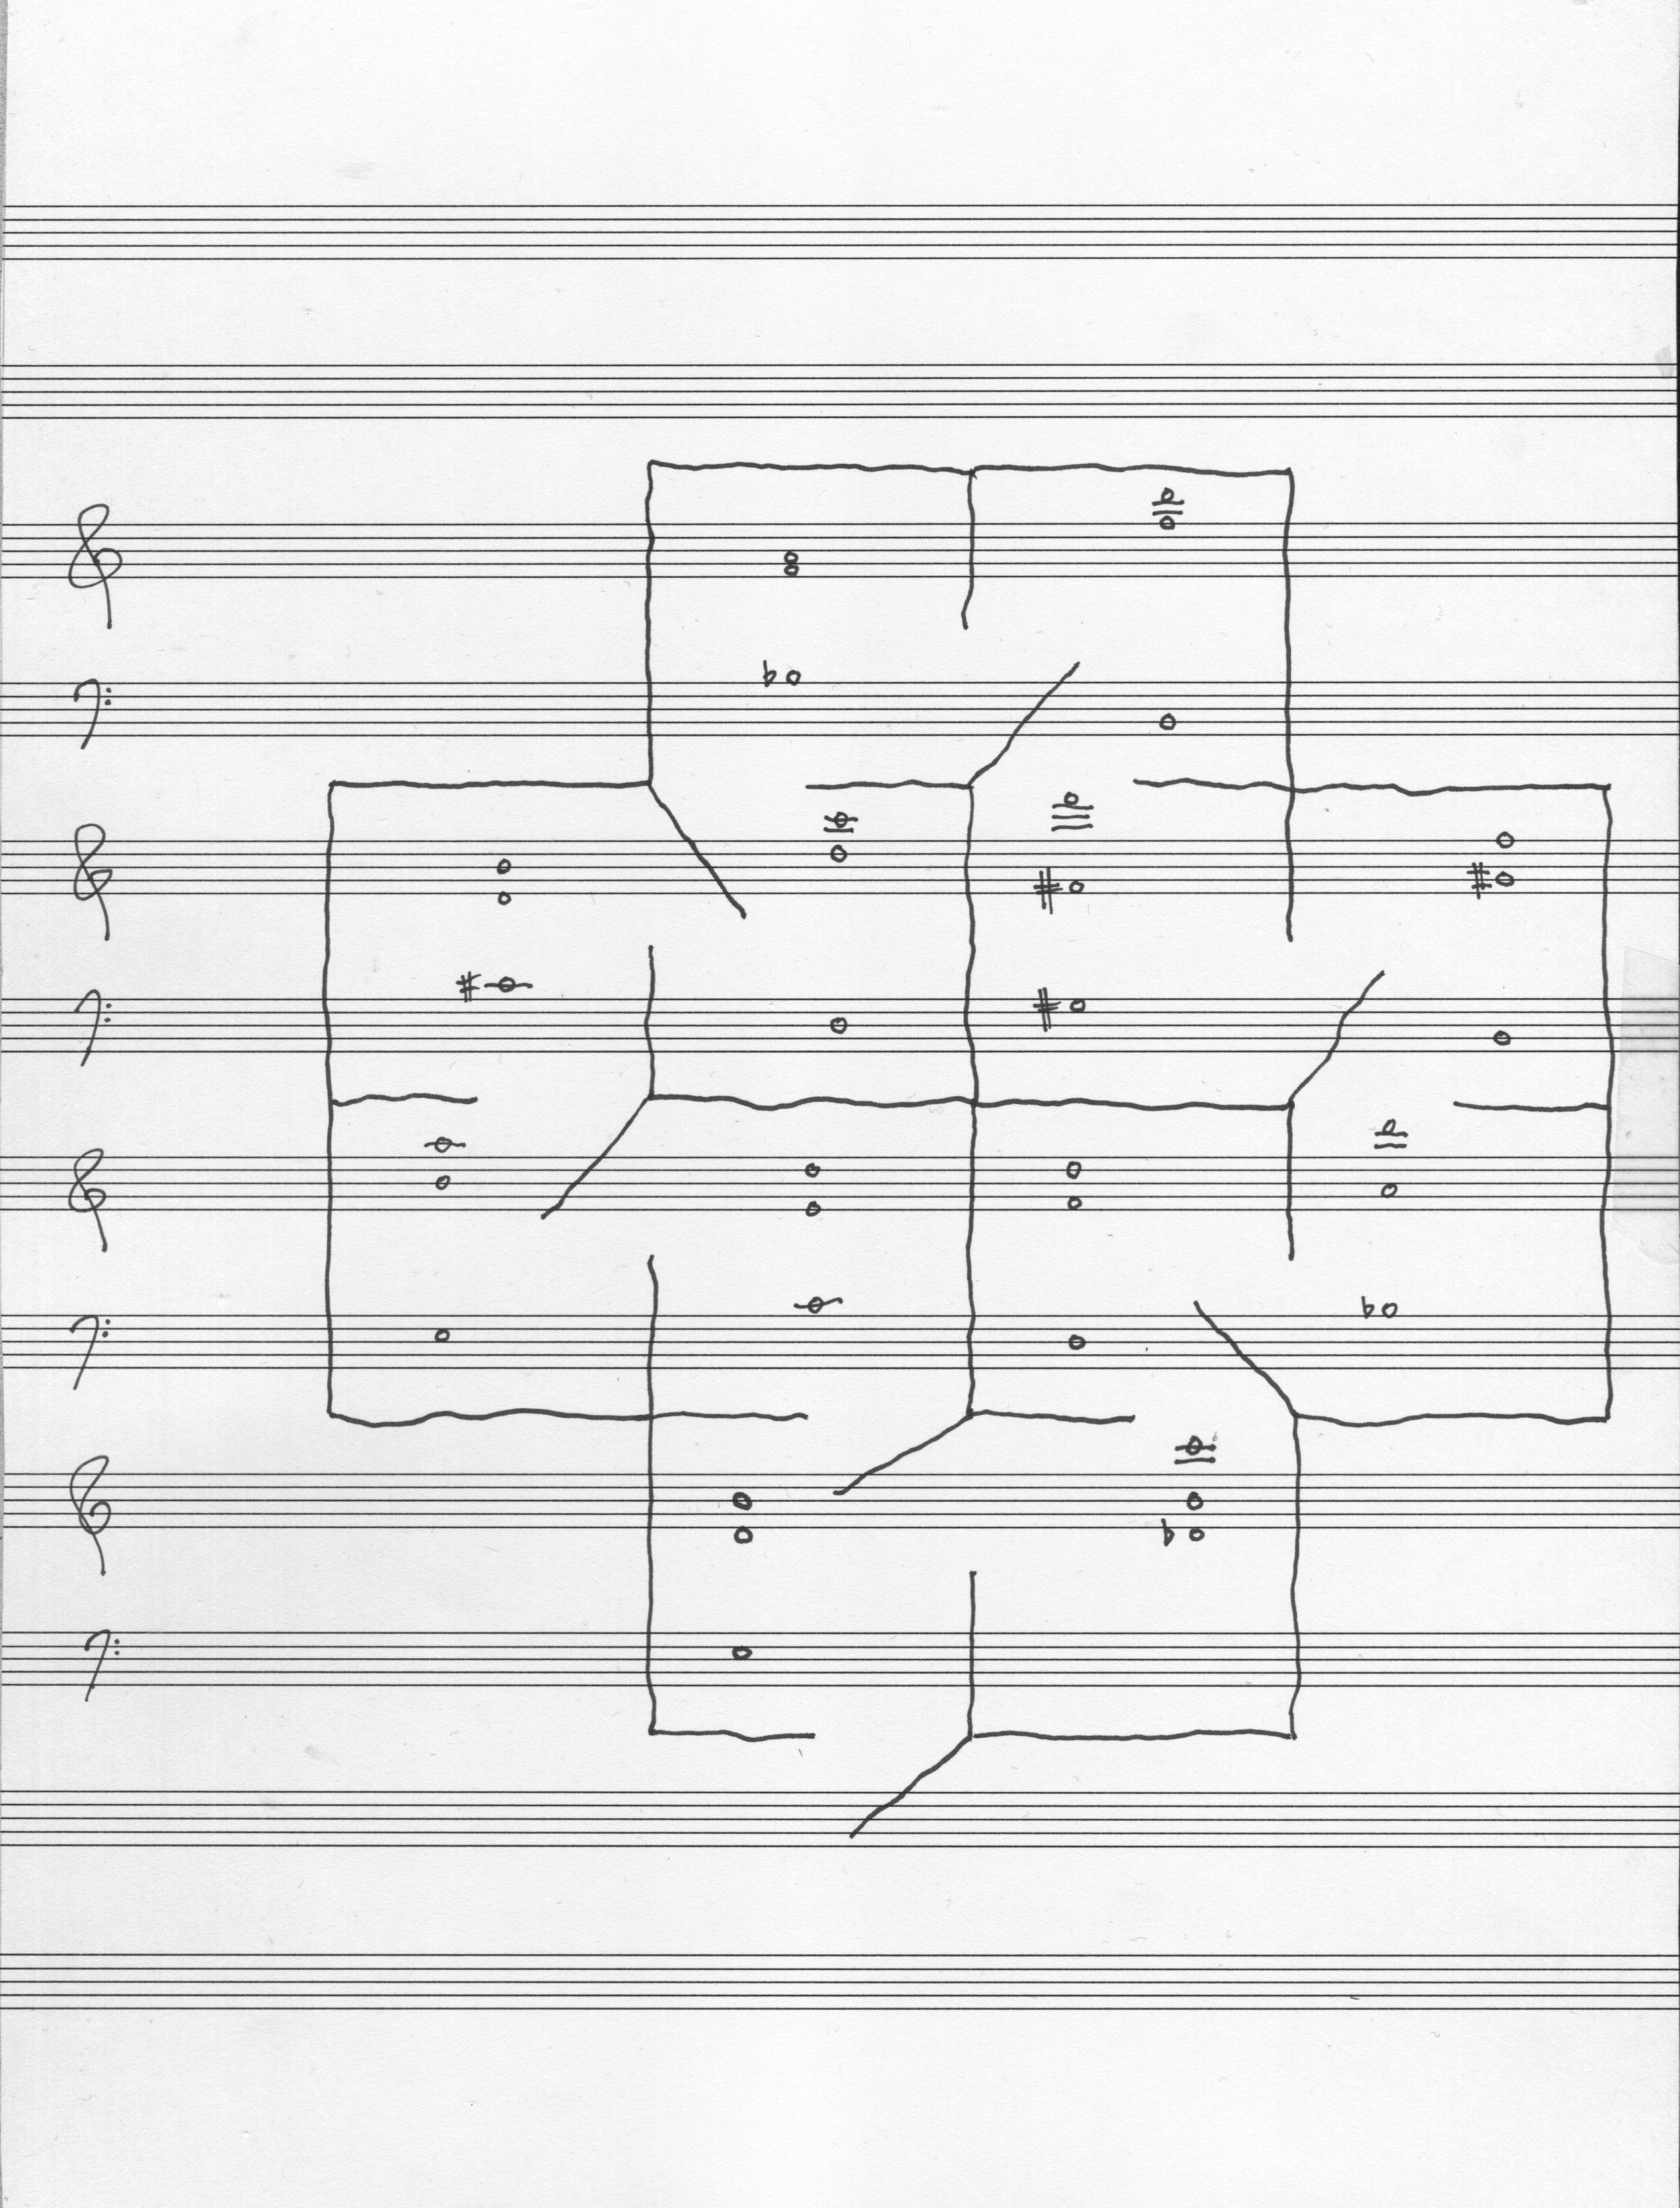 Piotr Bosacki, Music Chamber (szkic)